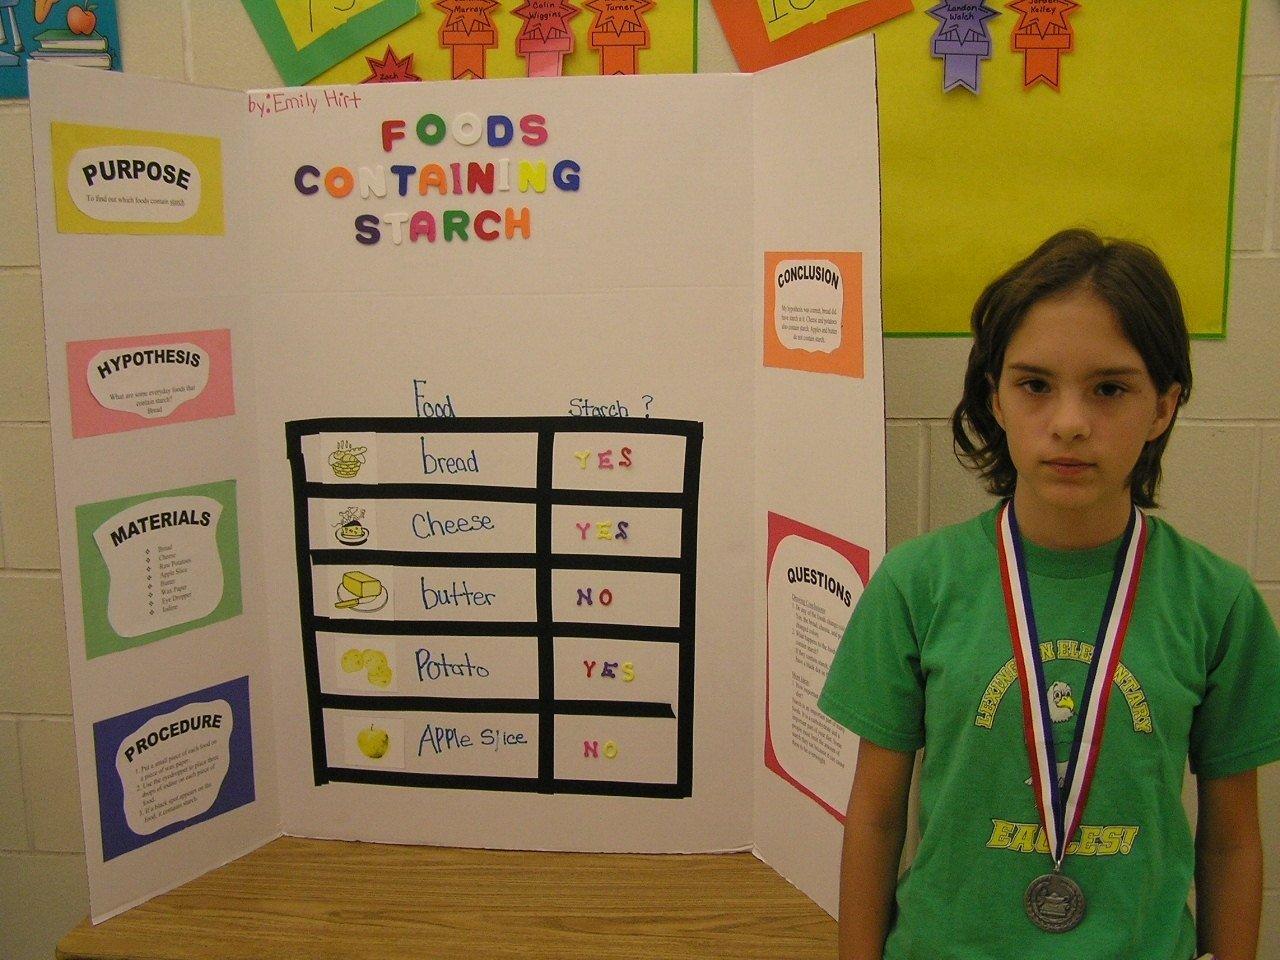 10 Nice Third Grade Science Fair Project Ideas science finally discovers my 3rd grade science fair project 7 2020